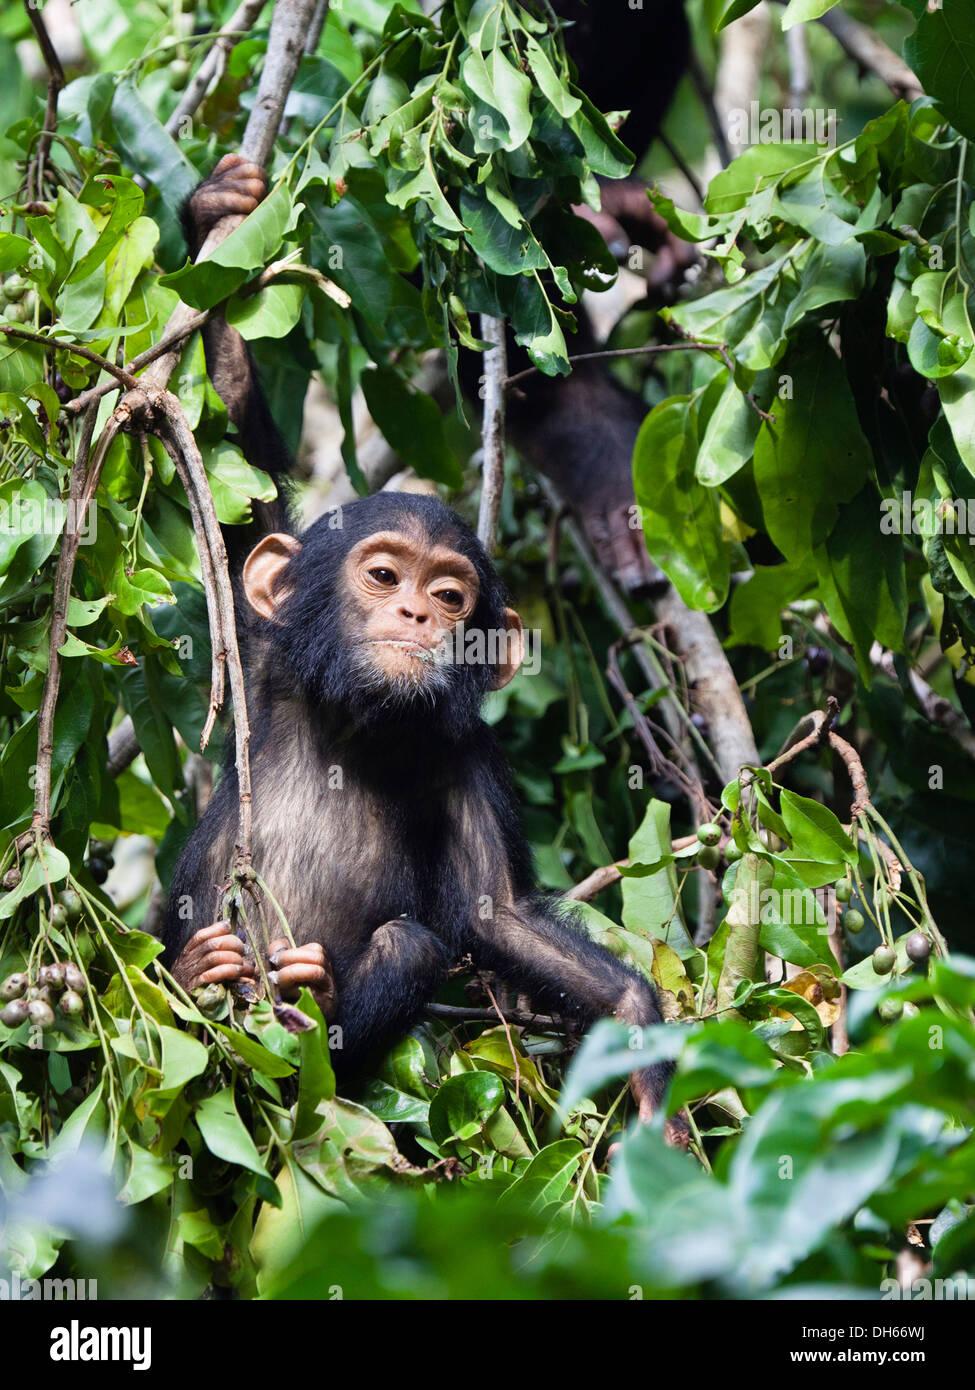 Young chimpanzee (Pan troglodytes), Mahale Mountains Nationalpark, Ostafrika, Tanzania - Stock Image